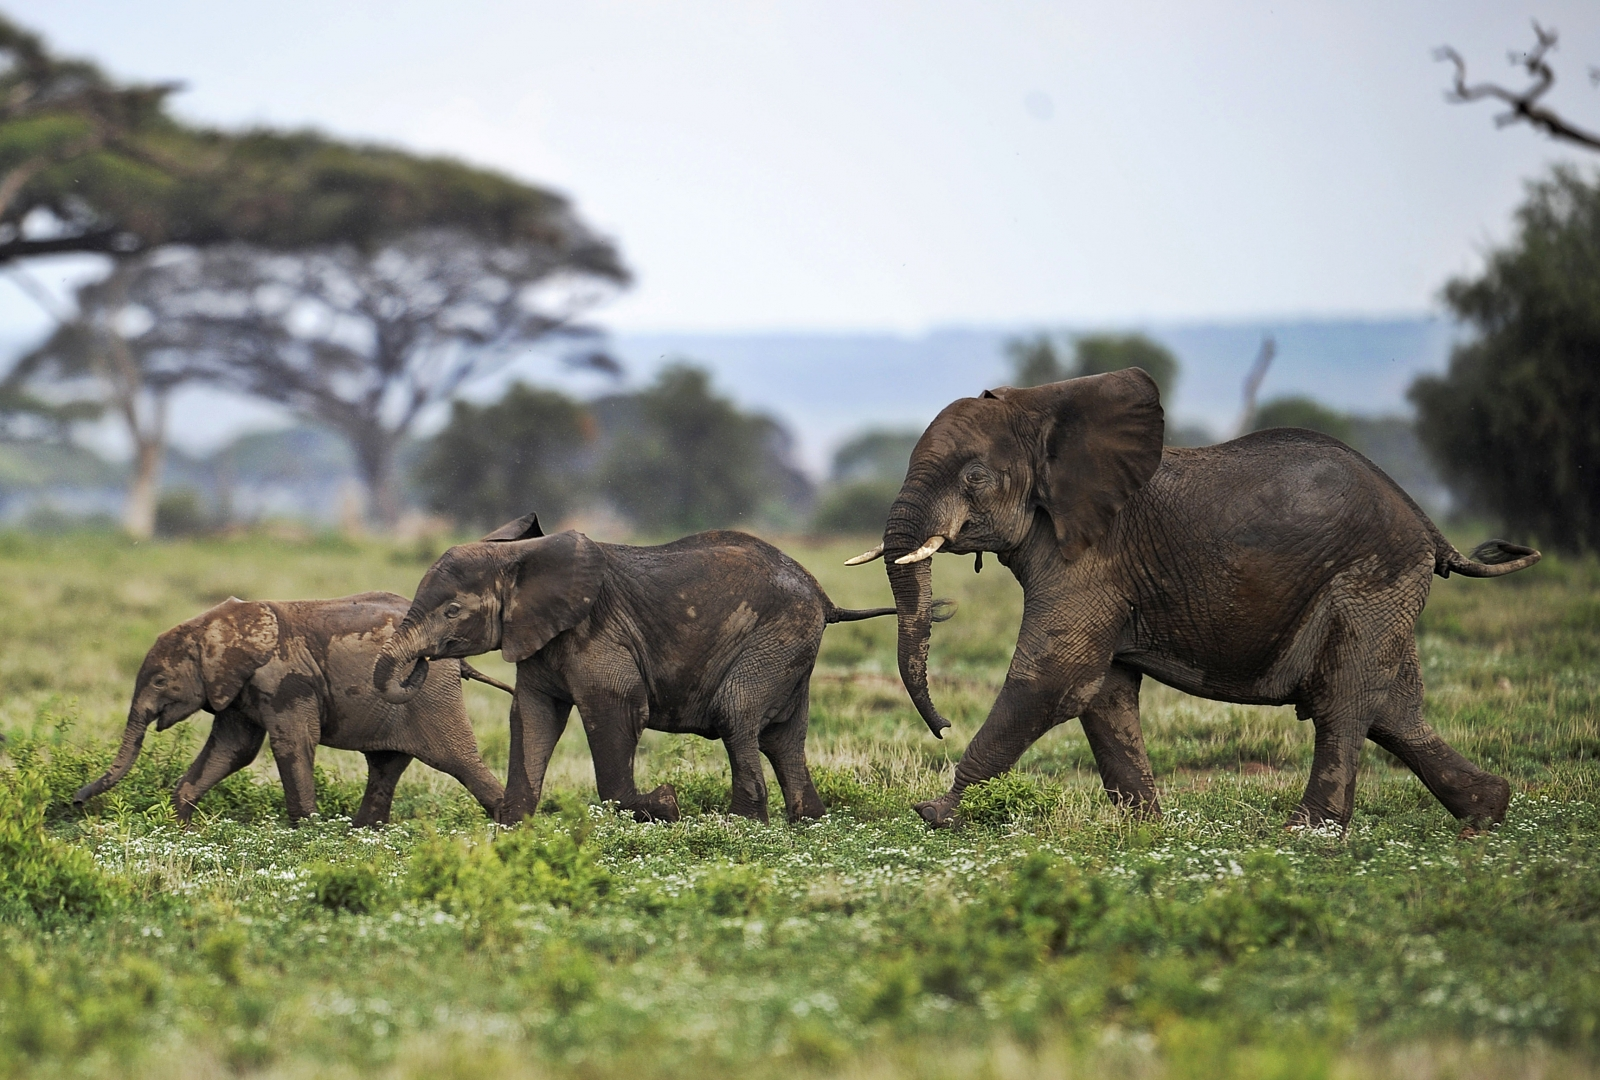 Elephant calves play at Amboseli